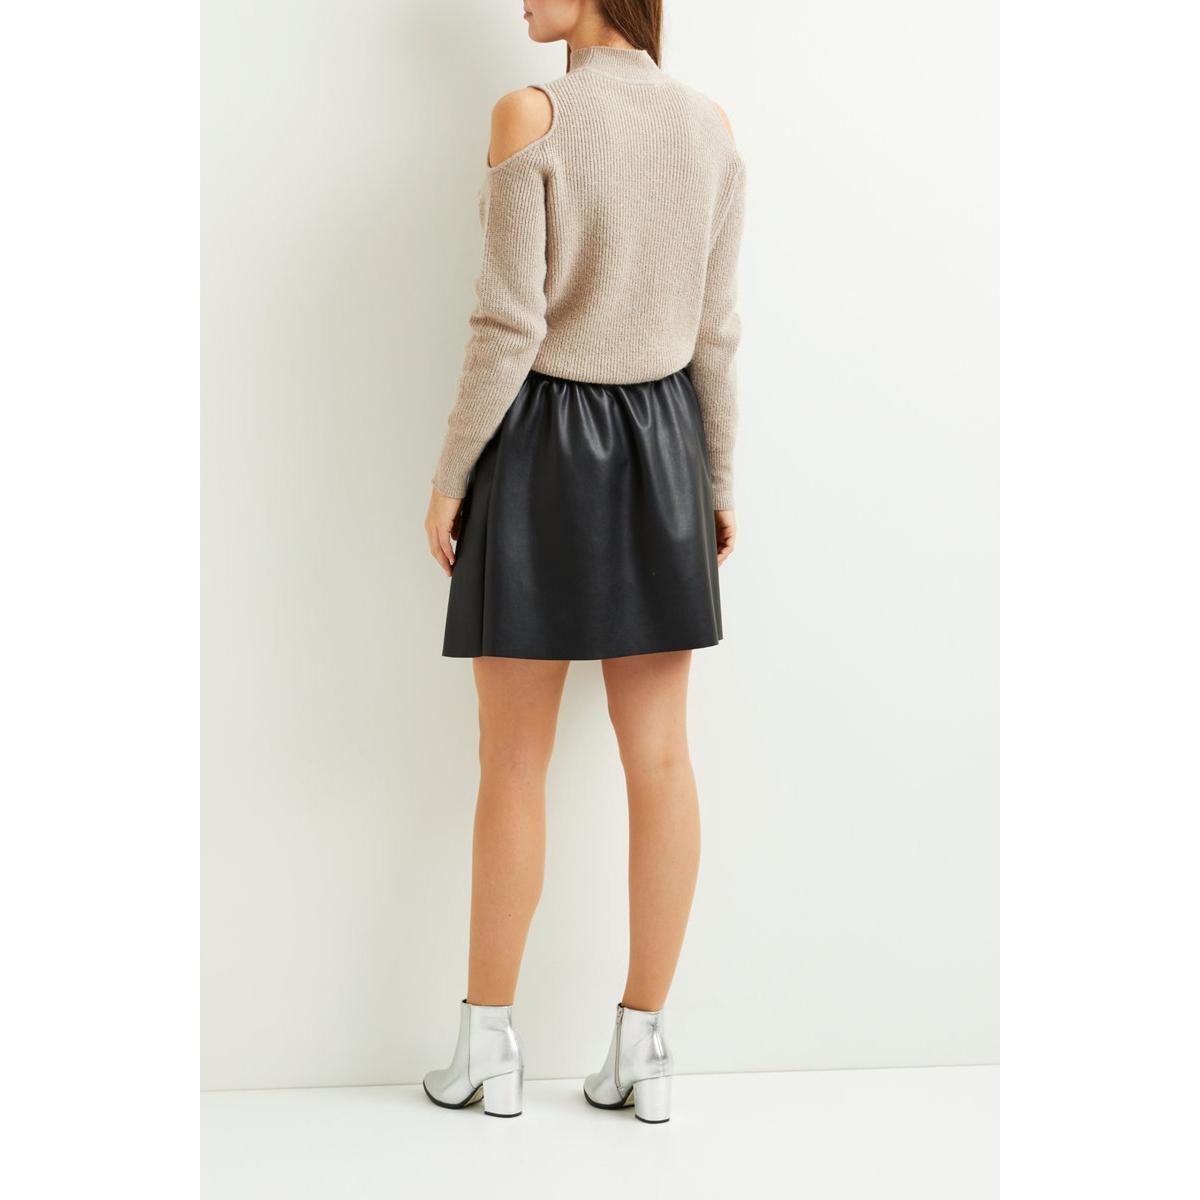 viemma faux leather skirt- noos 14044270 vila rok black